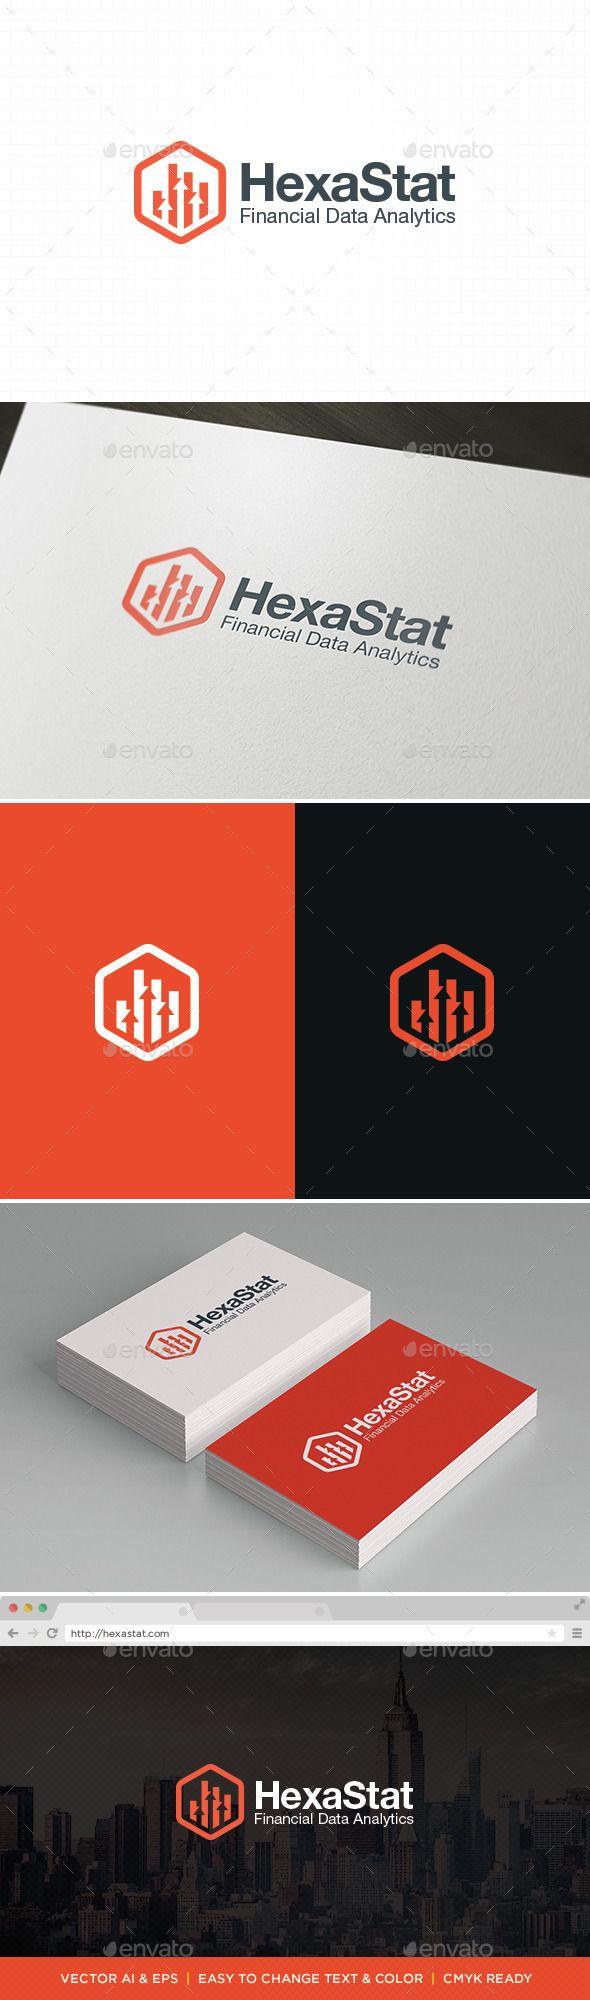 HexaStat - Logo Design Template Vector #logotype Download it here: http://graphicriver.net/item/hexastat-logo/11422471?s_rank=285?ref=nexion